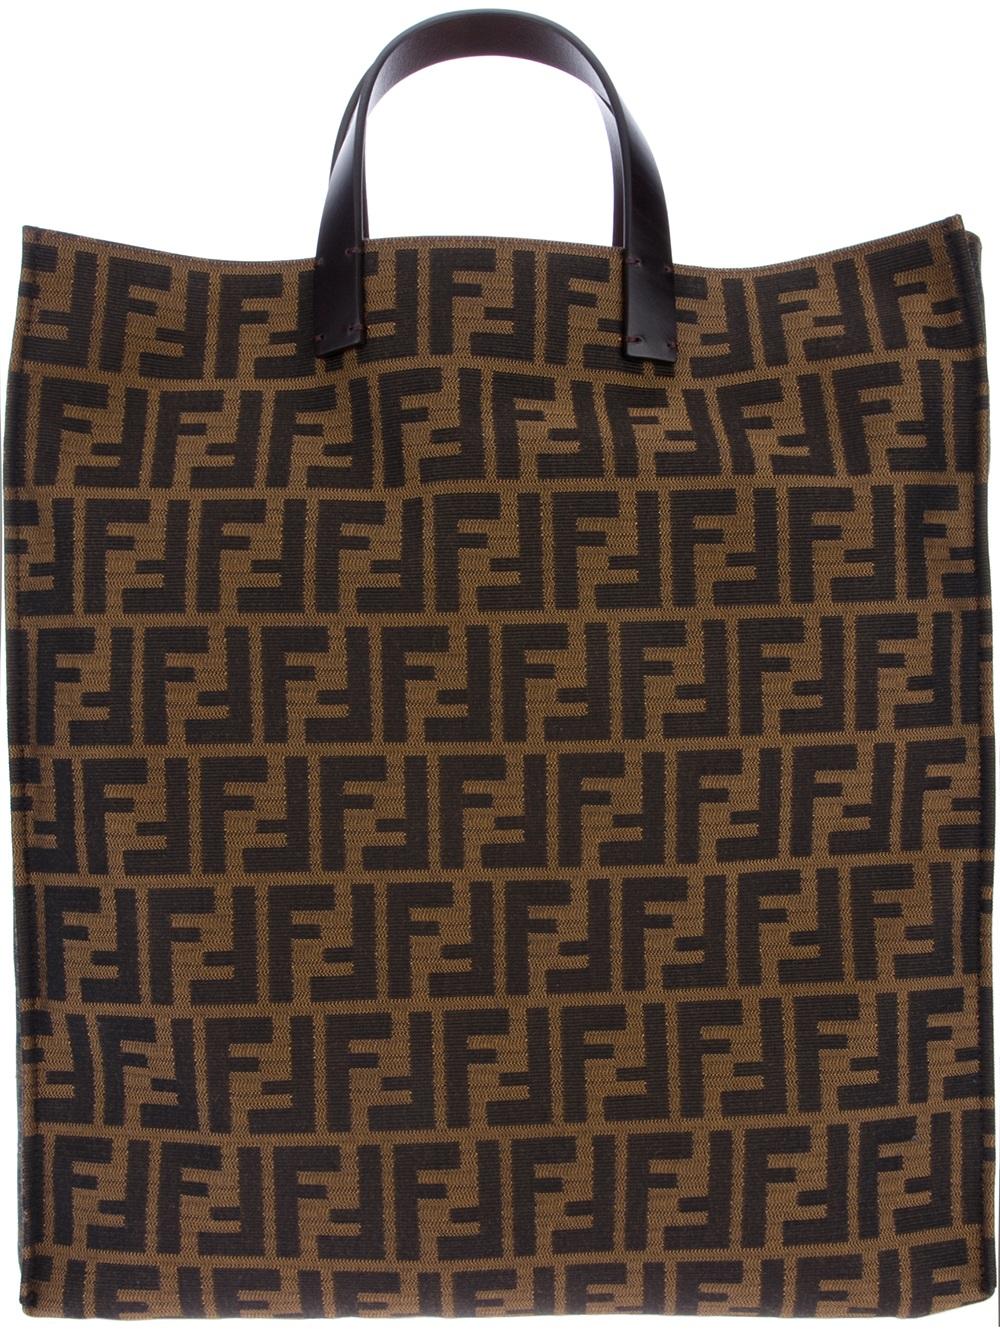 4c11eeff5d Fendi Logo Shopper Bag in Brown - Lyst